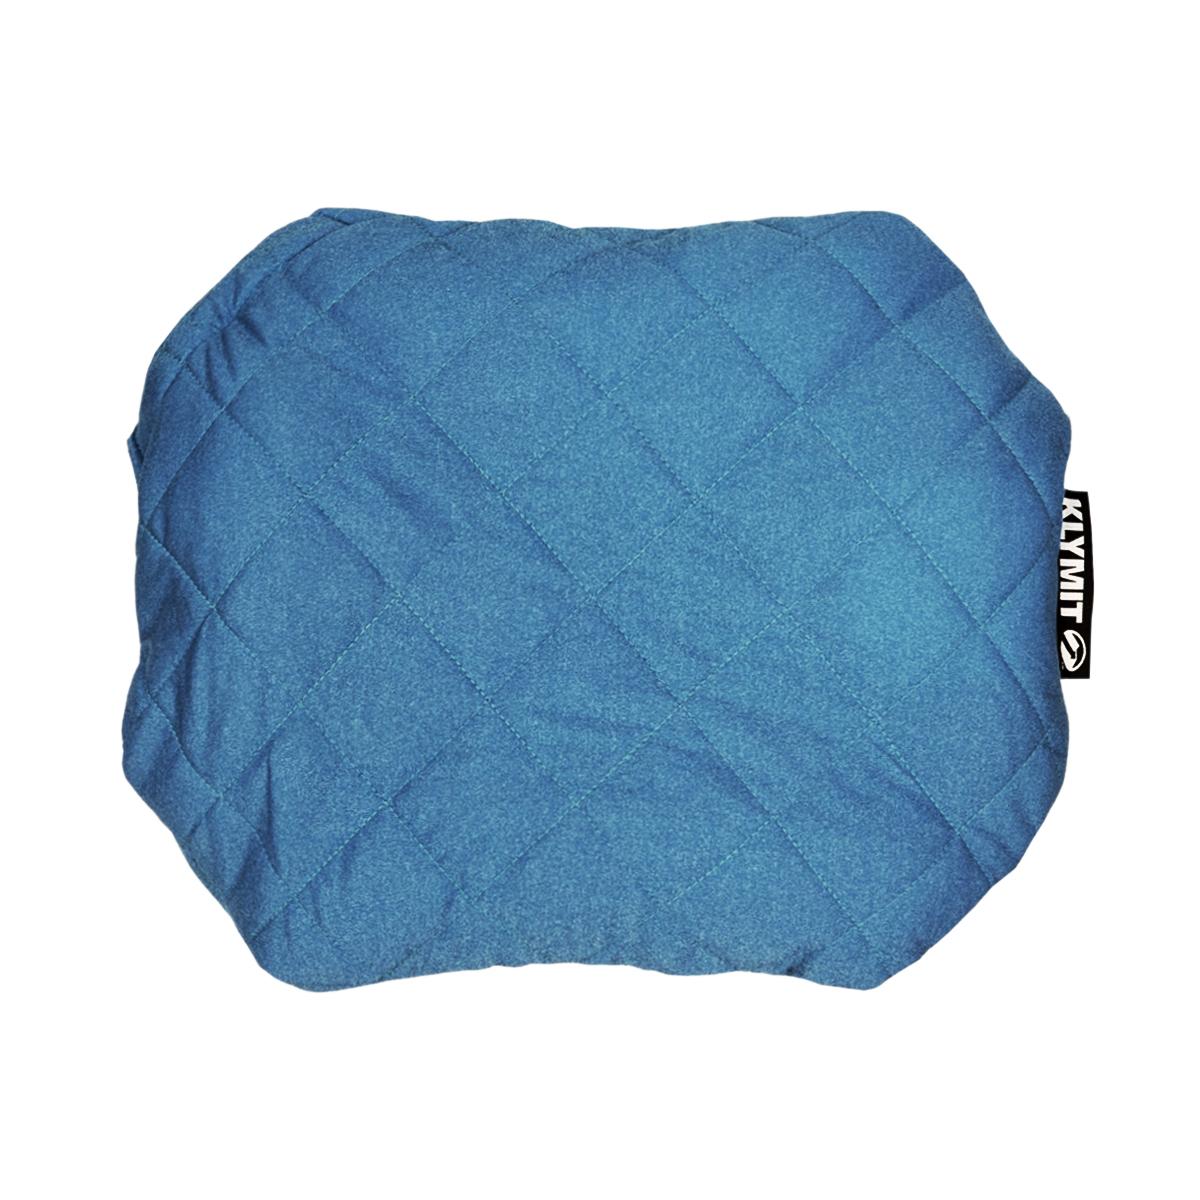 klymit quilted pillow x